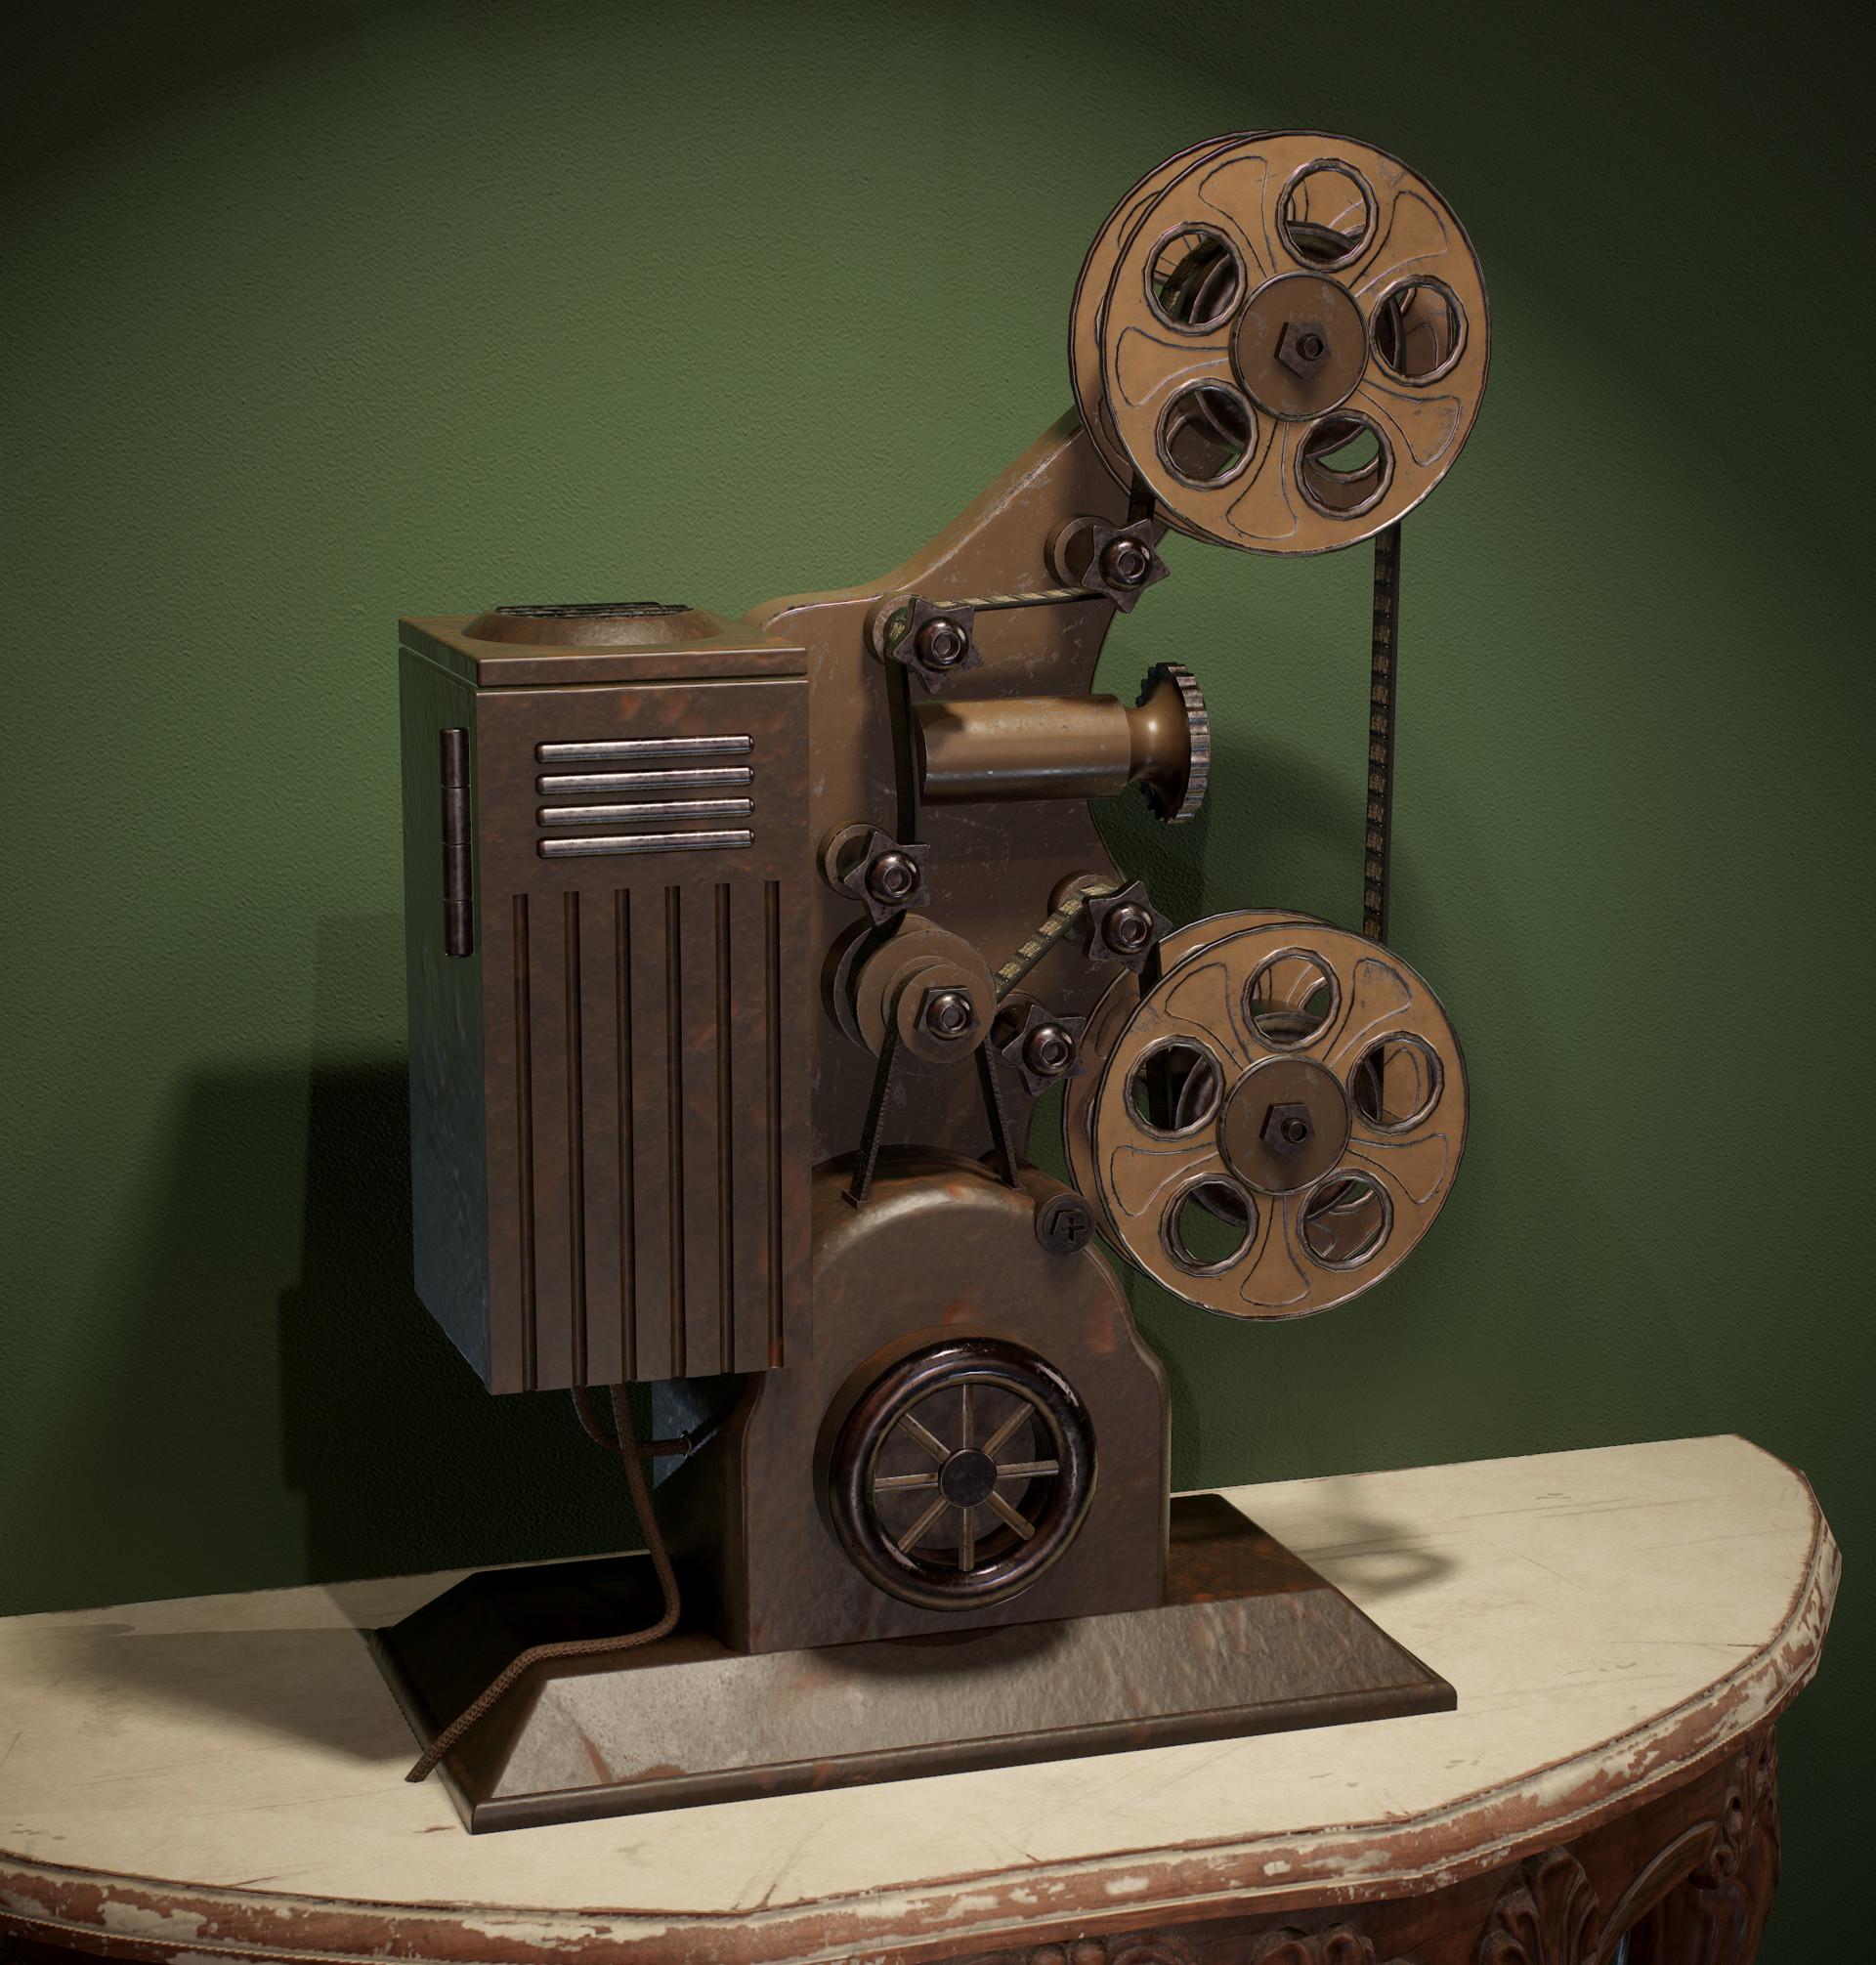 Tamara orlova projector